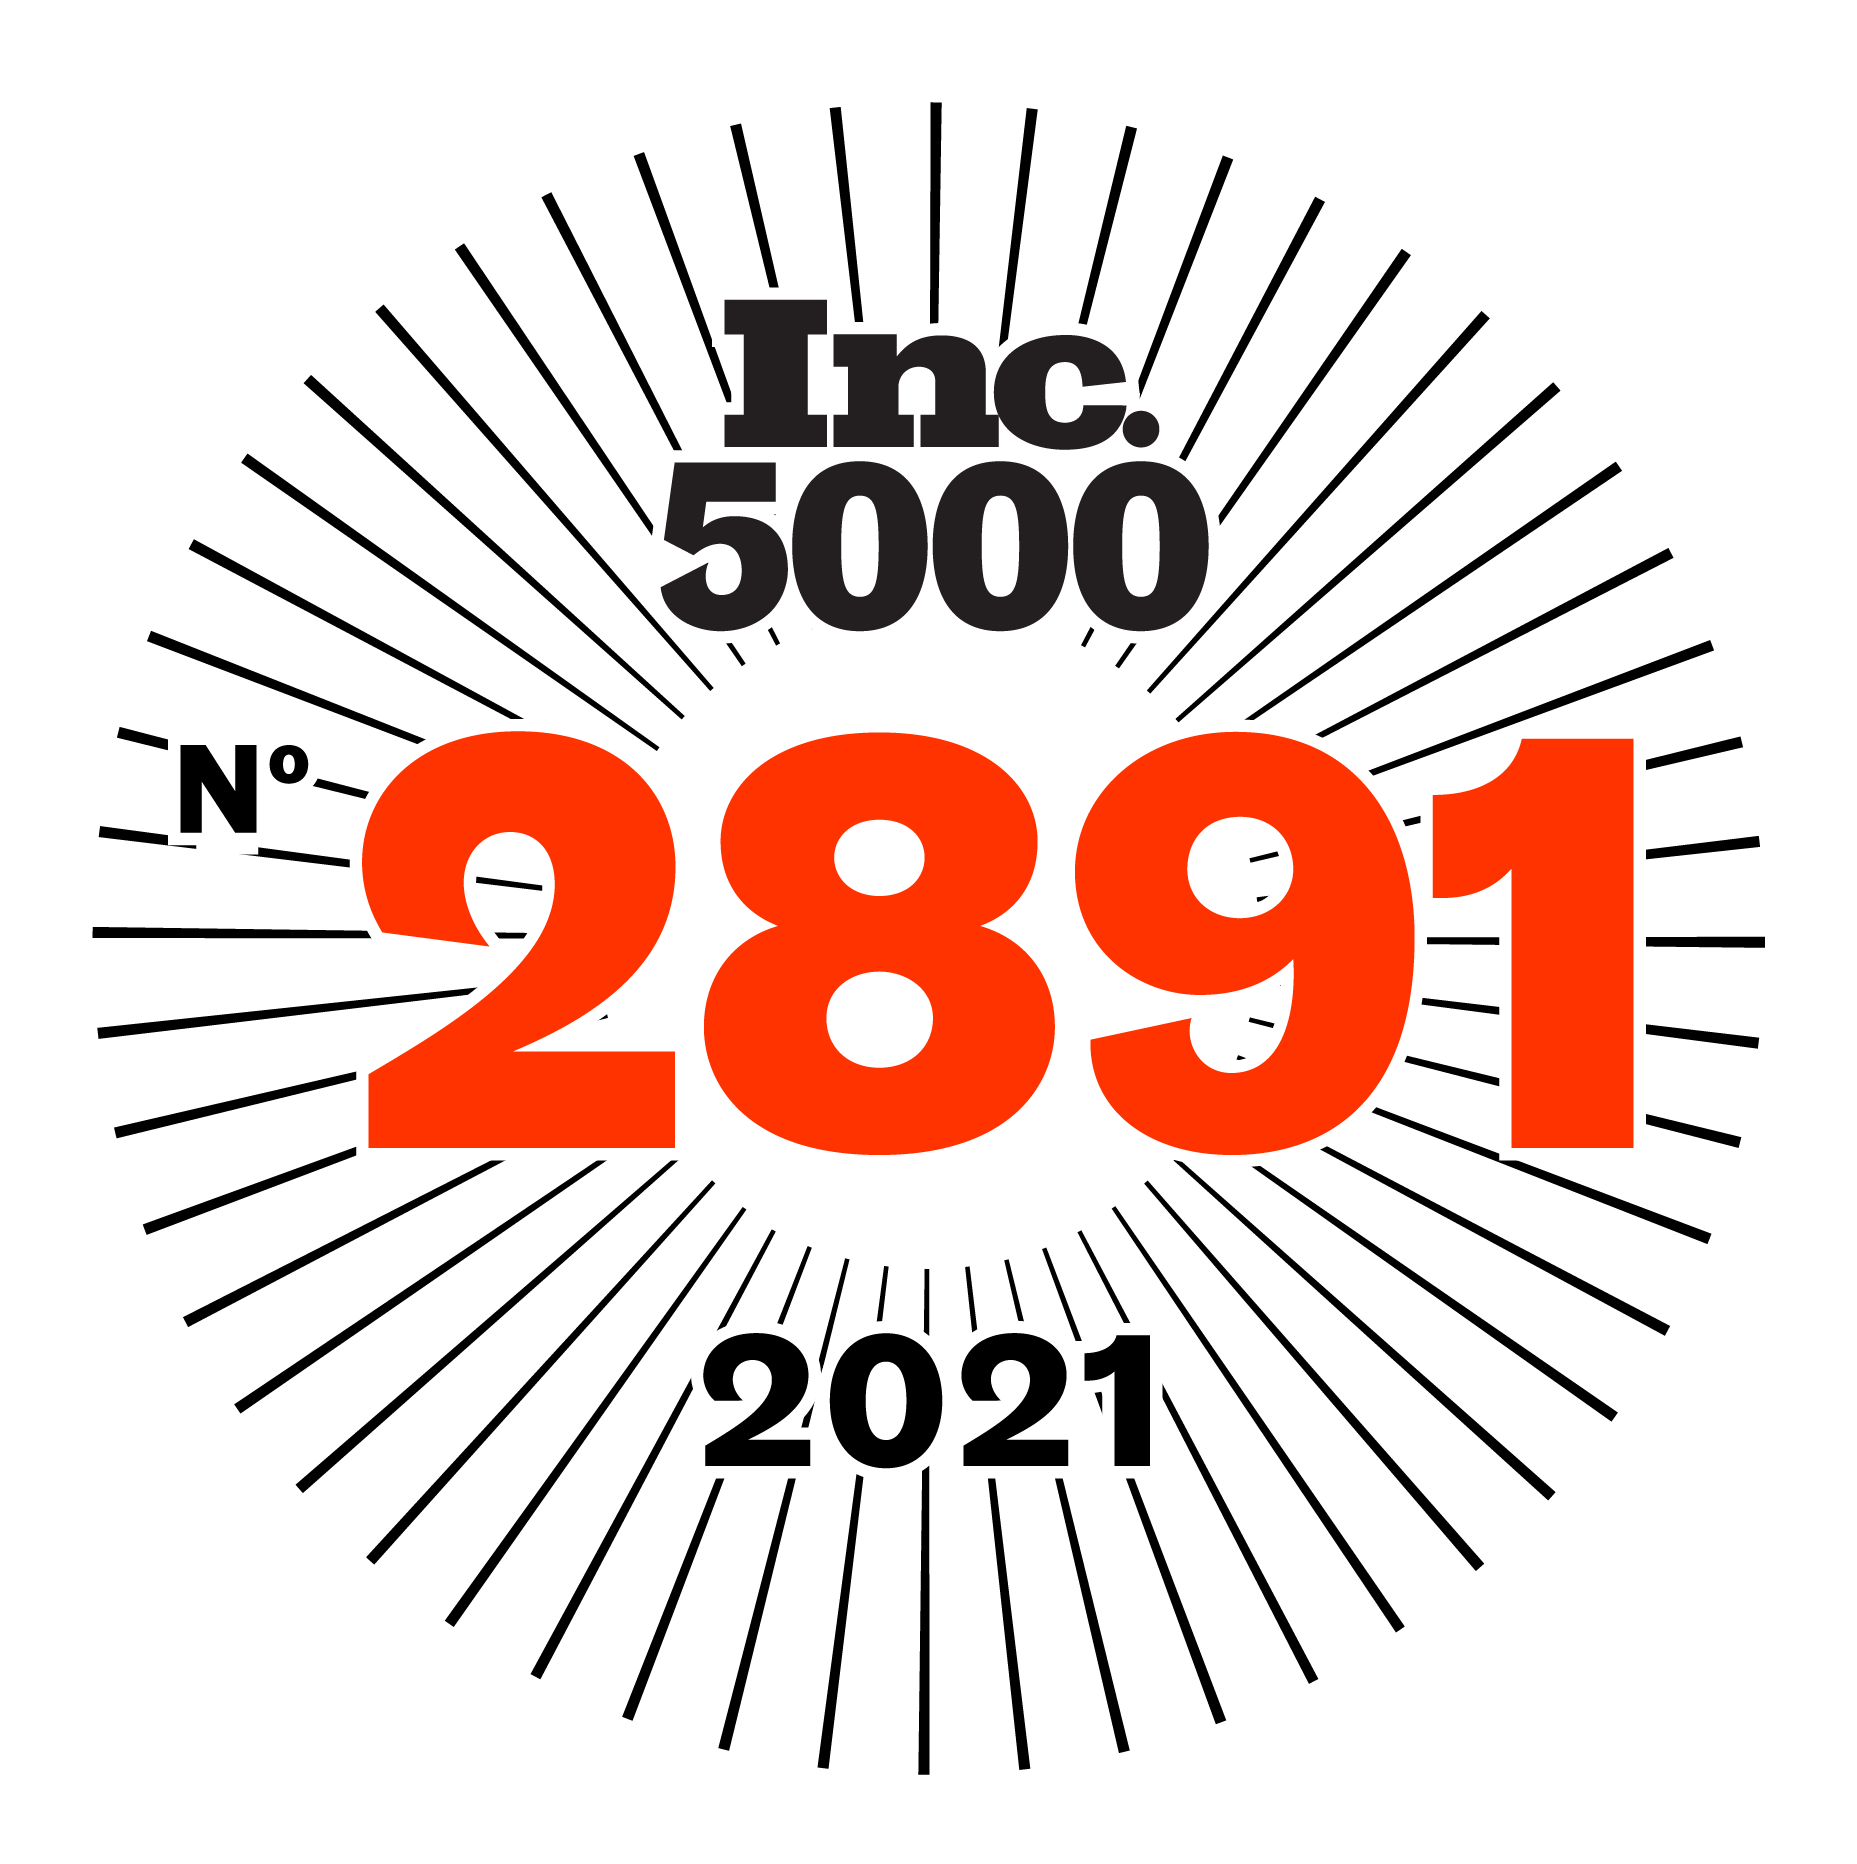 2021 Inc. 5000 List